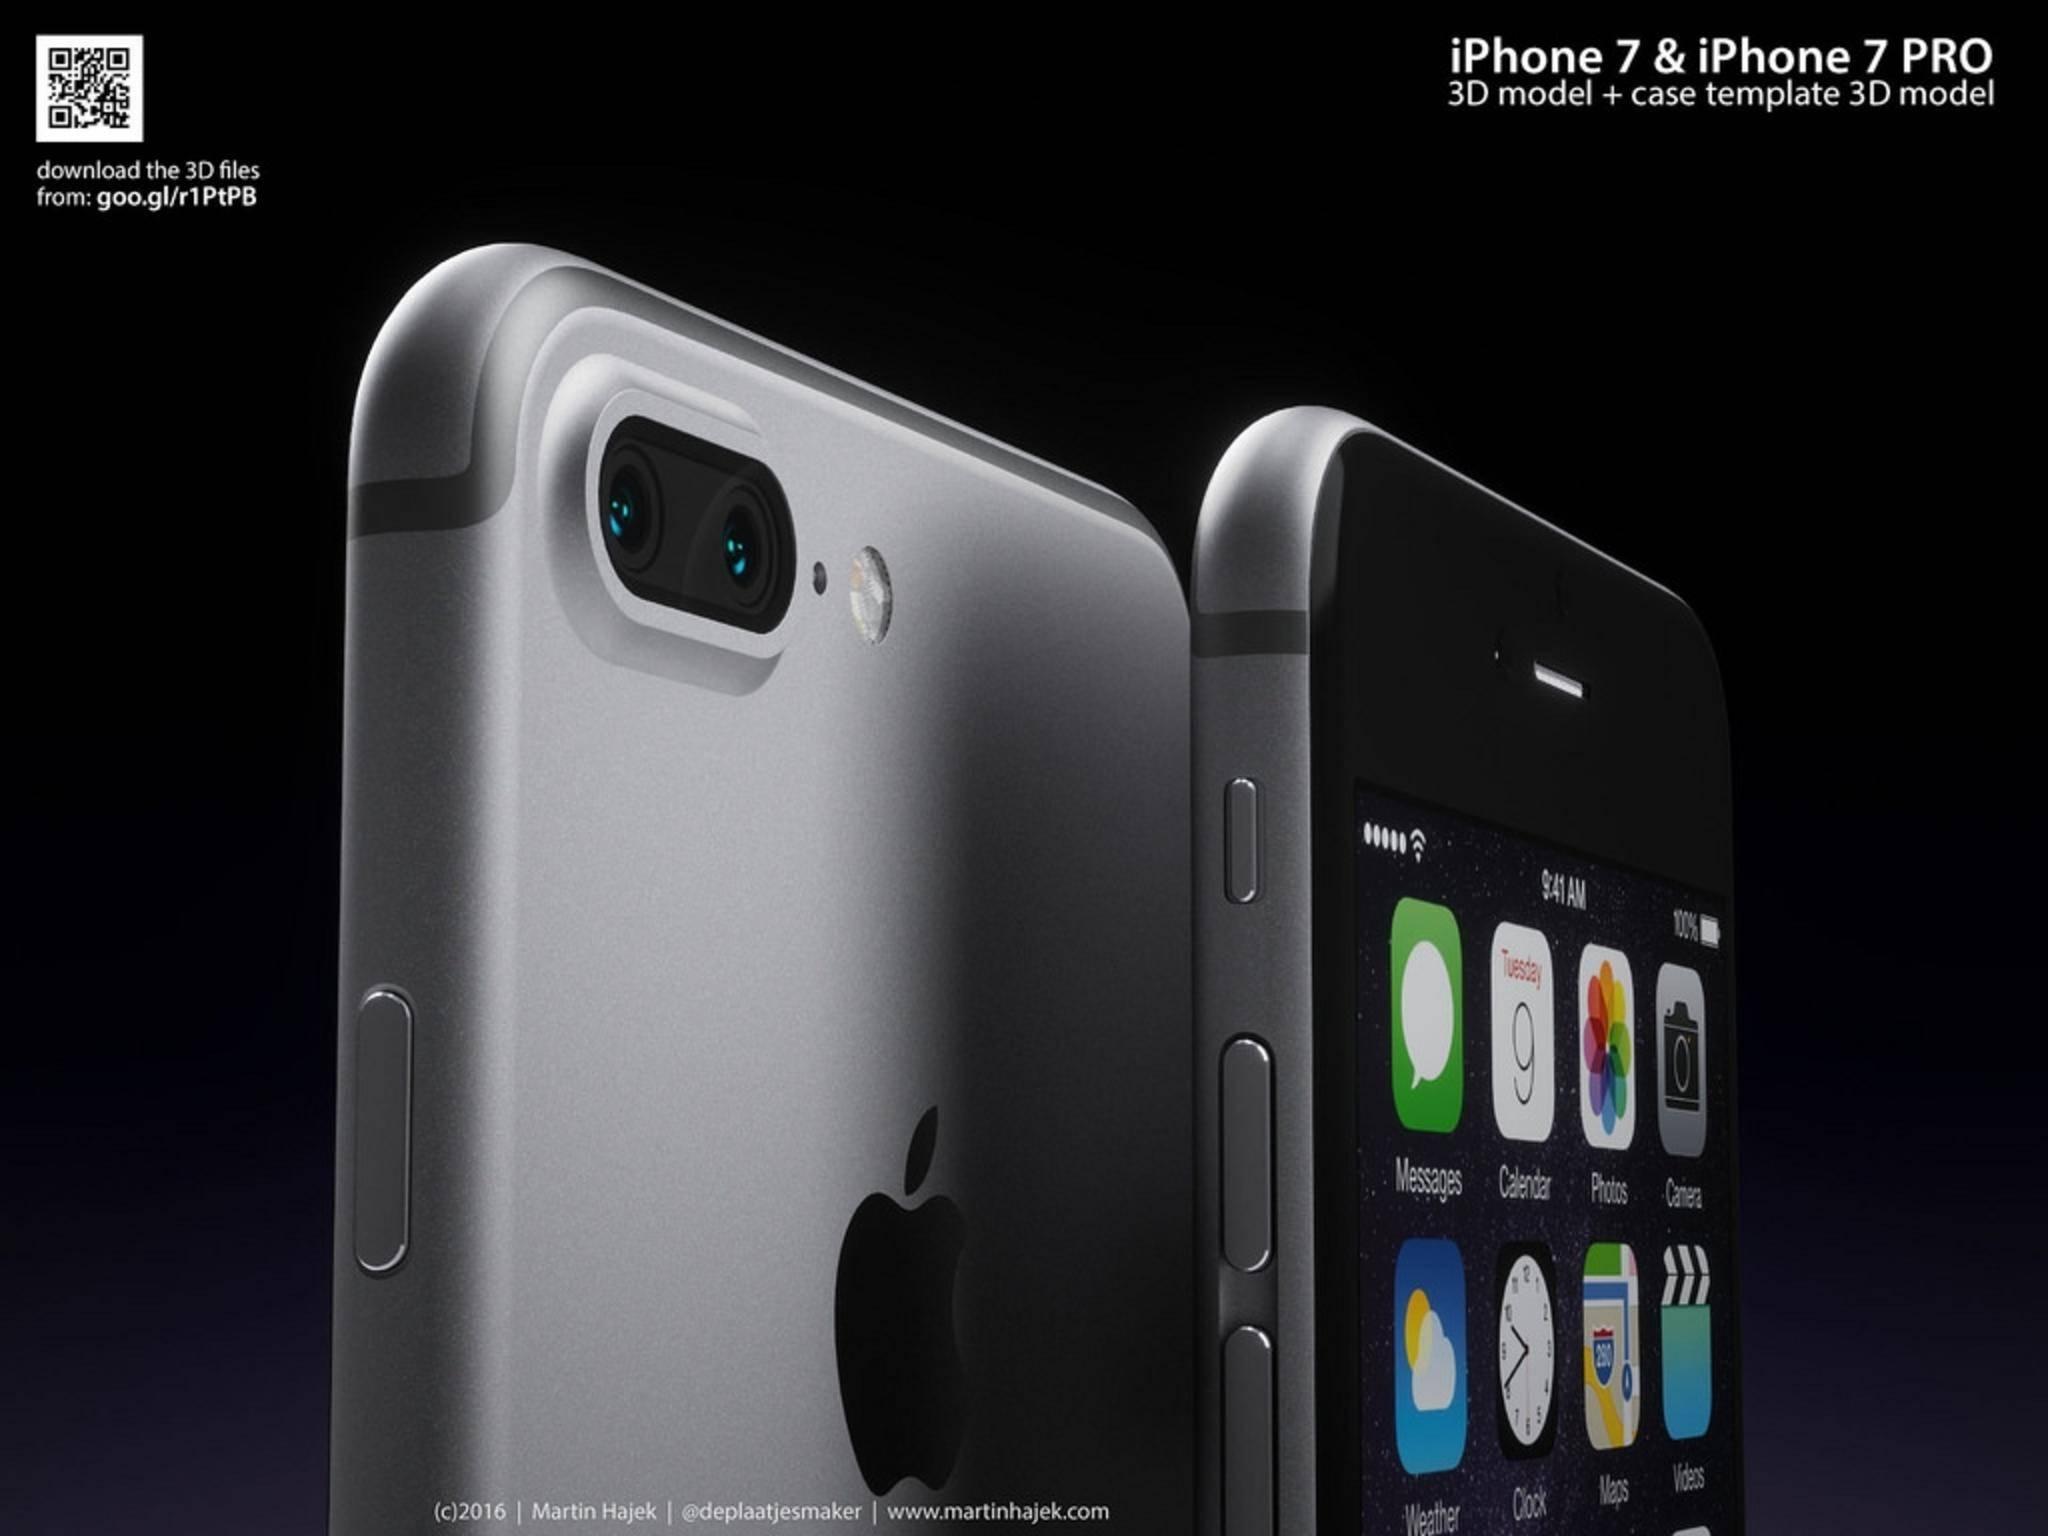 So soll es aussehen: Das iPhone 7 Plus.